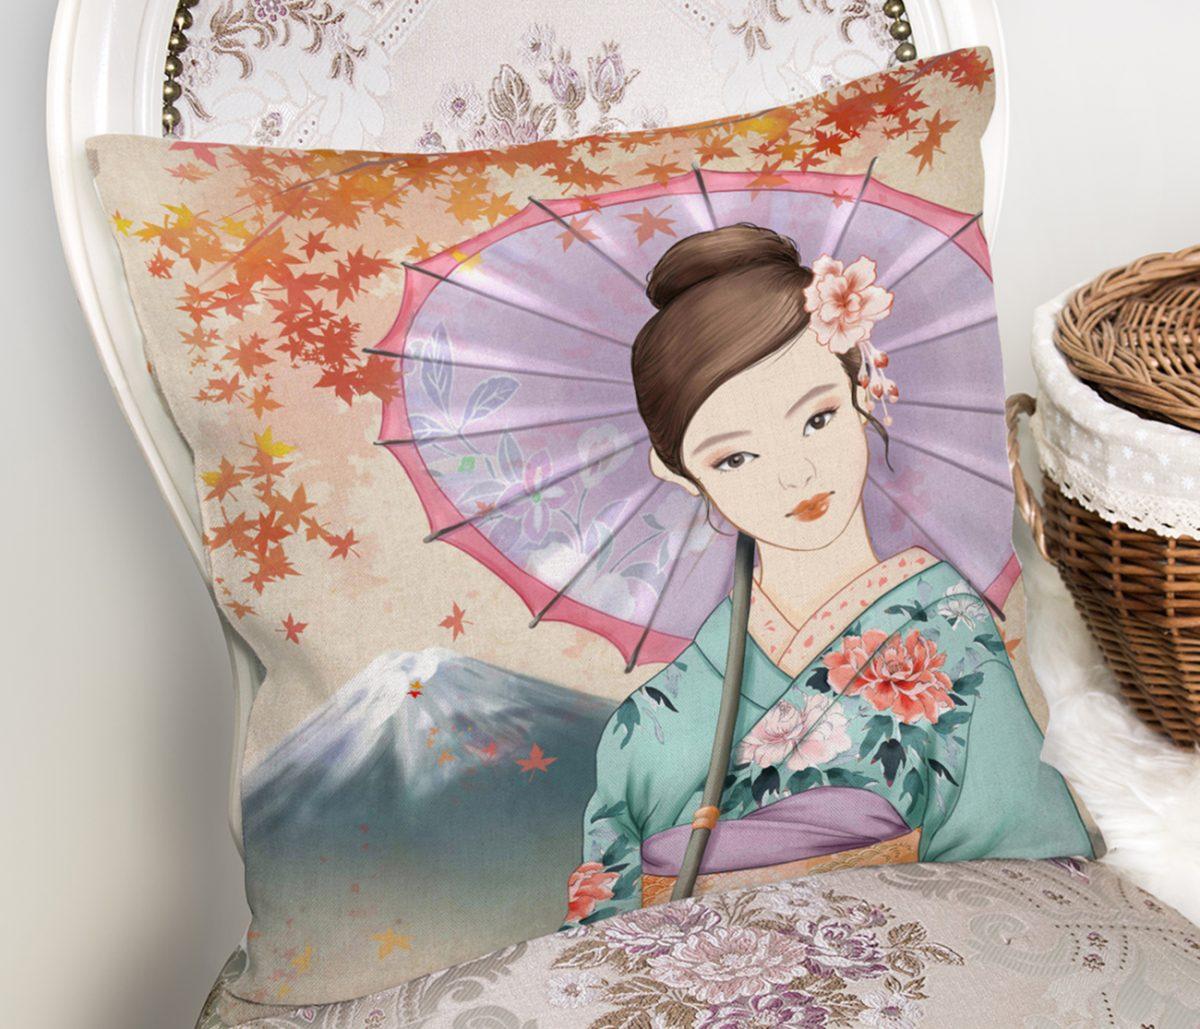 Şemsiyeli Japon Kız Motifli Dekoratif Kırlent Kılıfı Realhomes